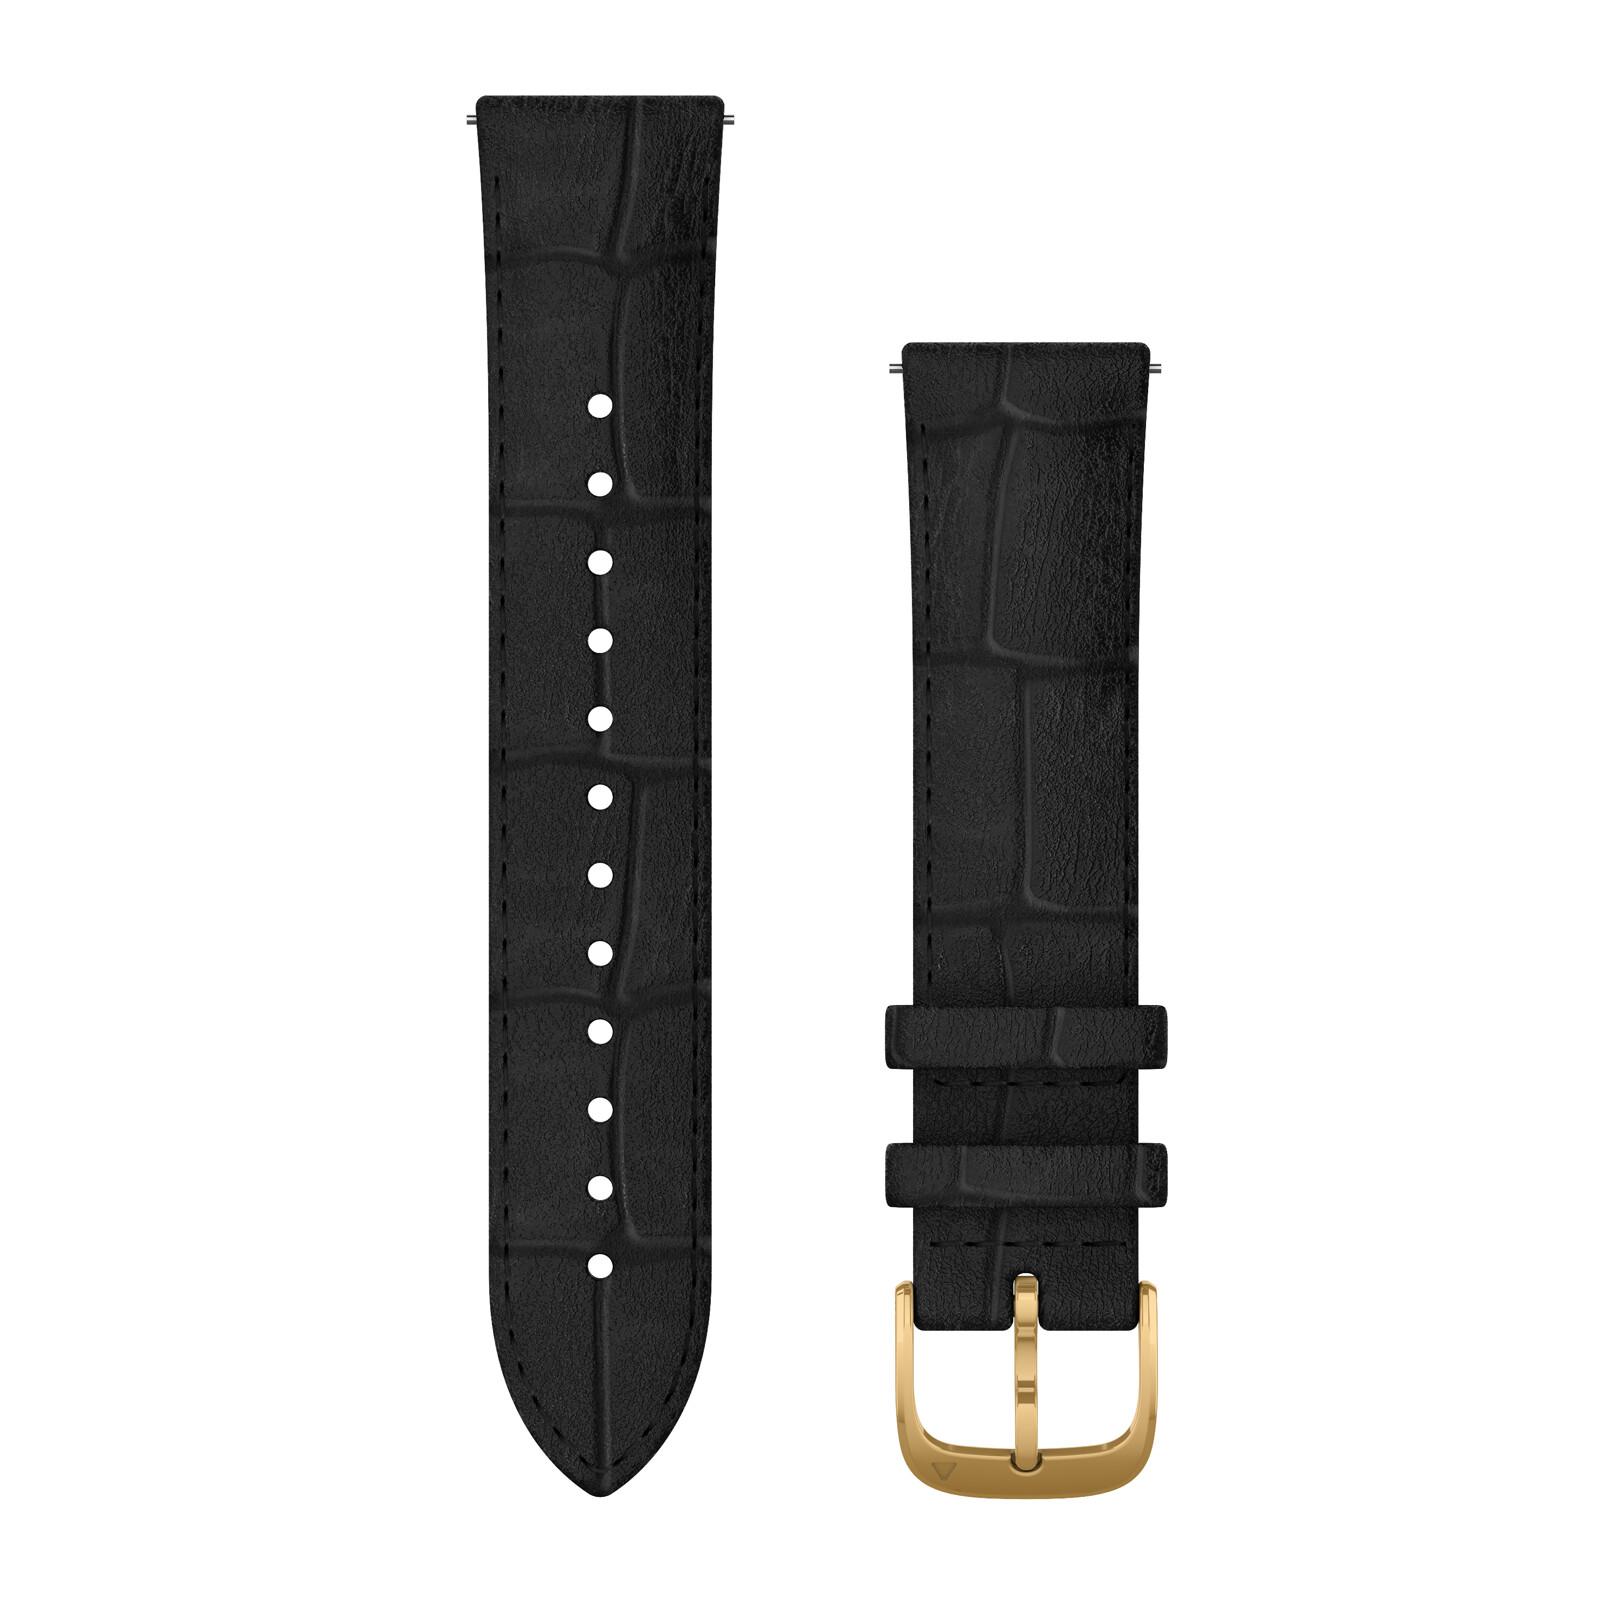 Garmin Uhrenarmband Vivomove 20mm Leder Schwarz